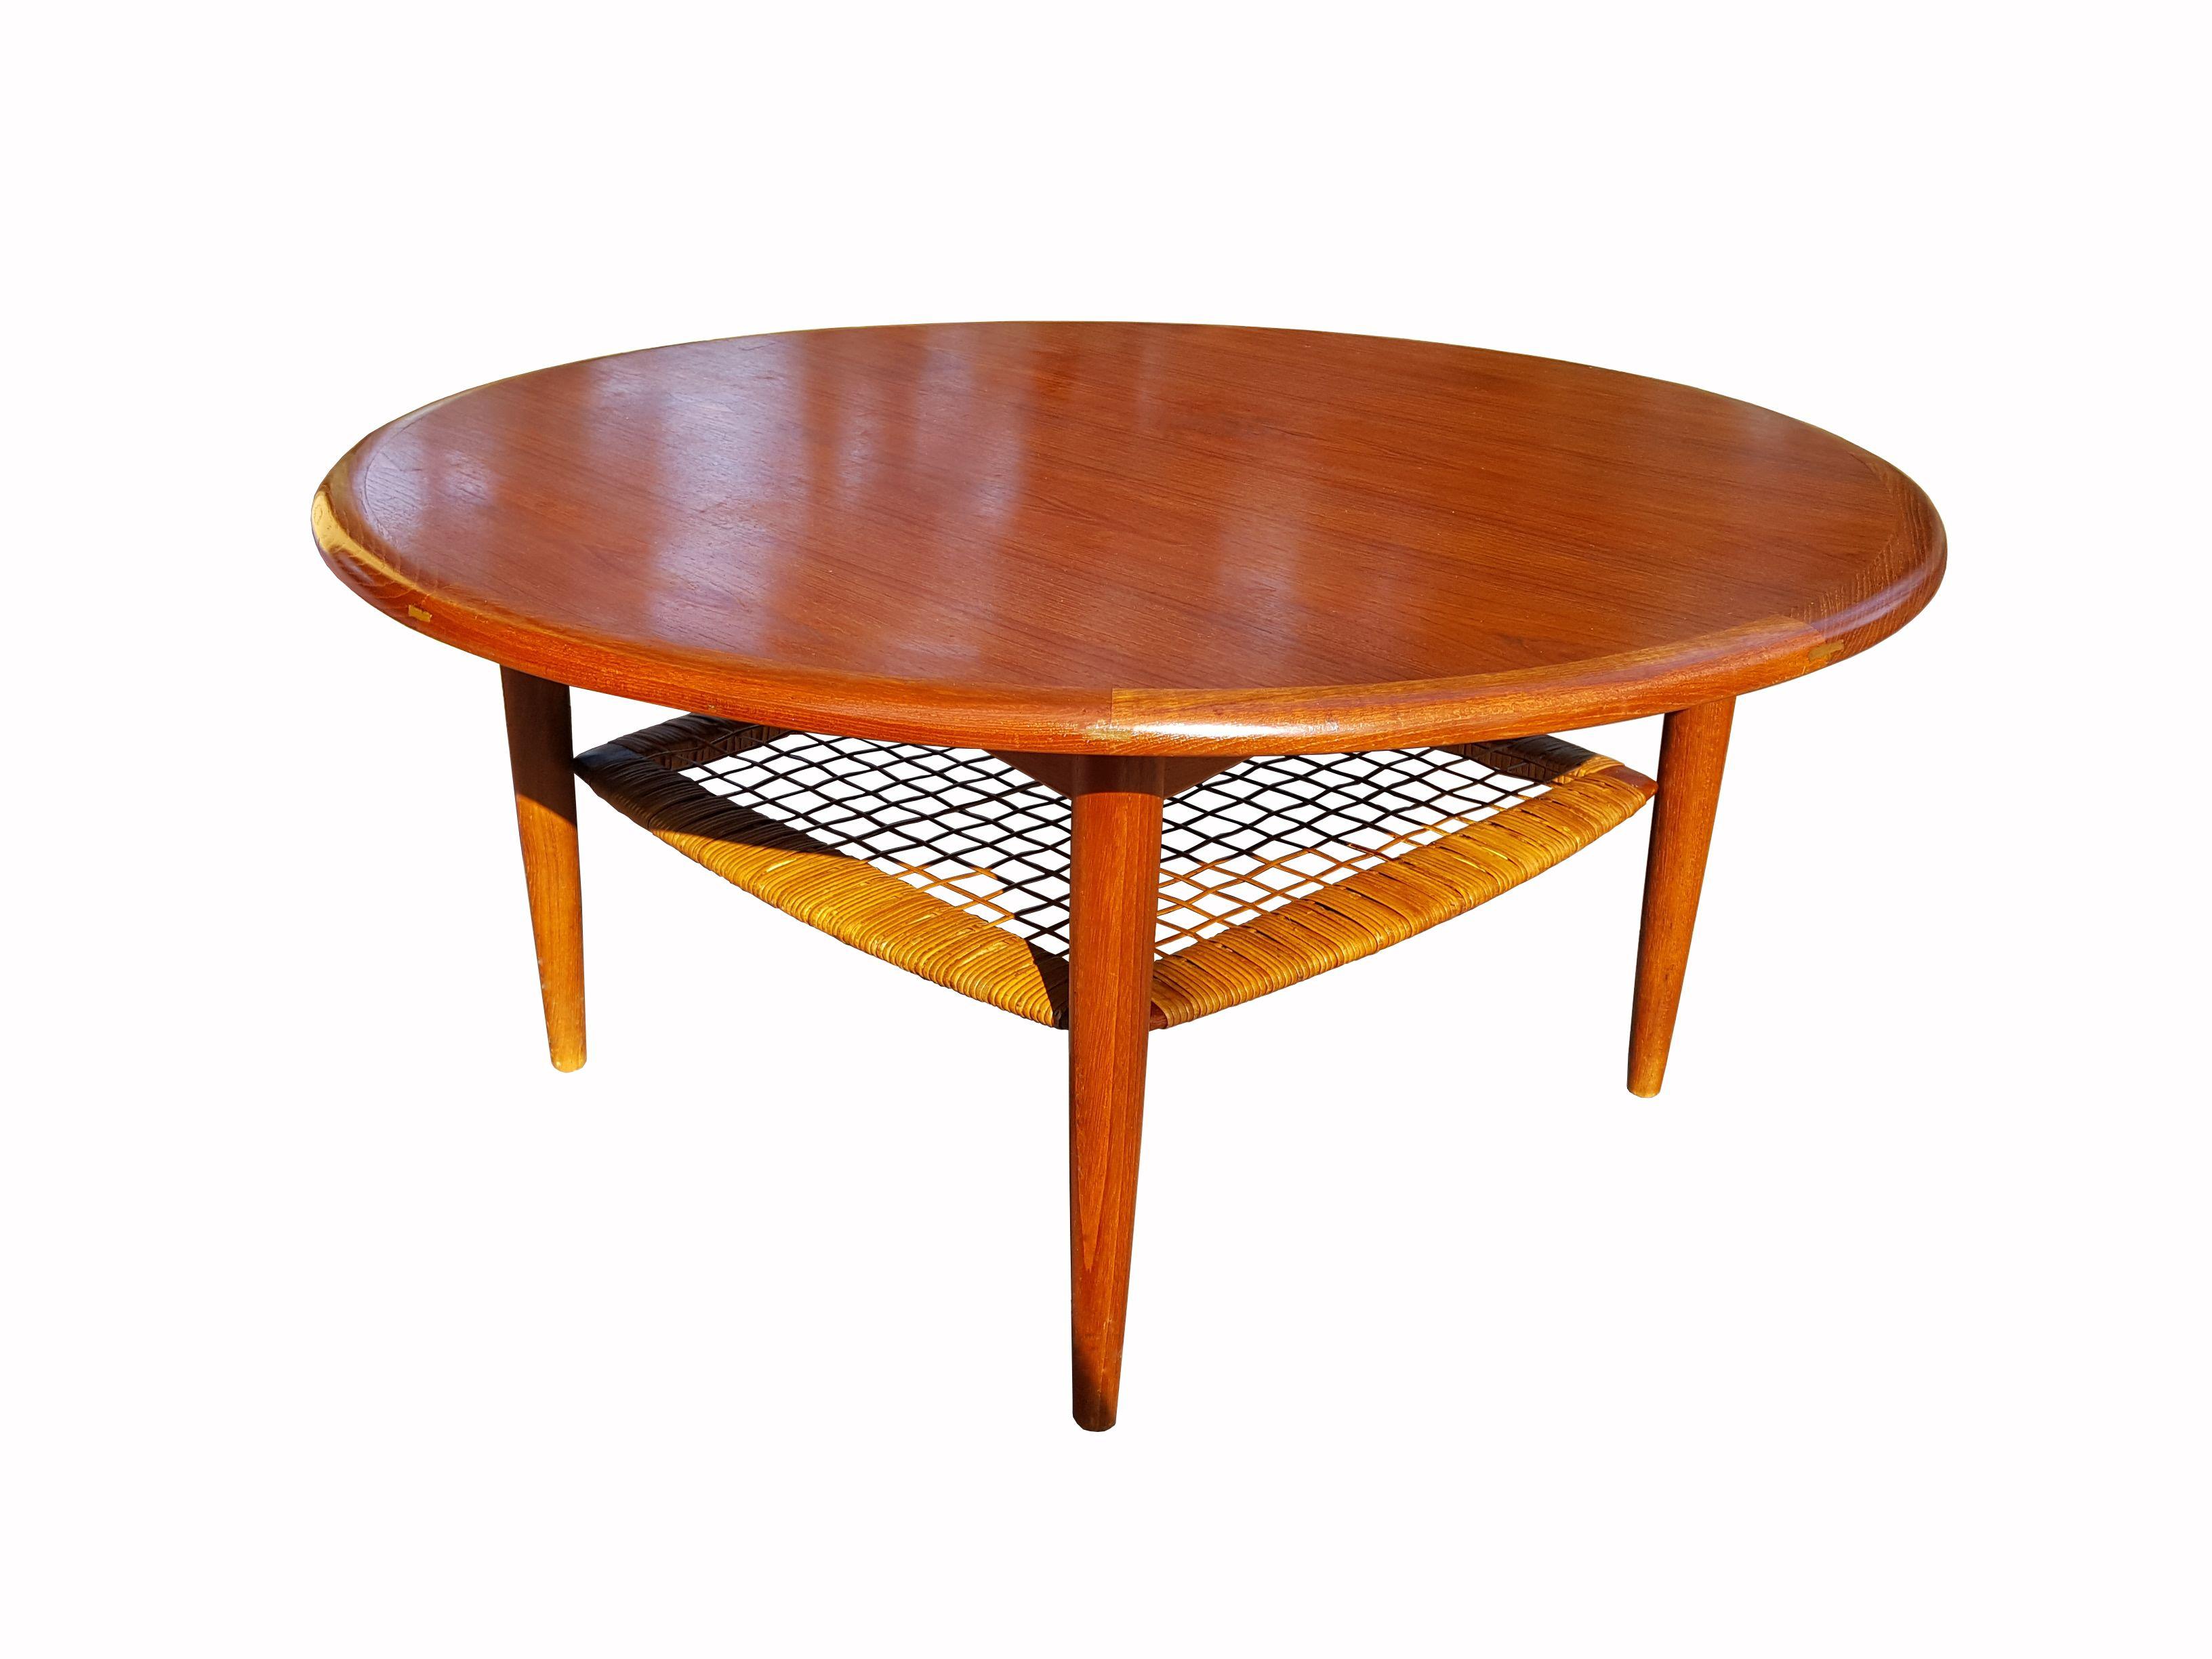 Danish mid century modern teak coffee table with cane shelf by